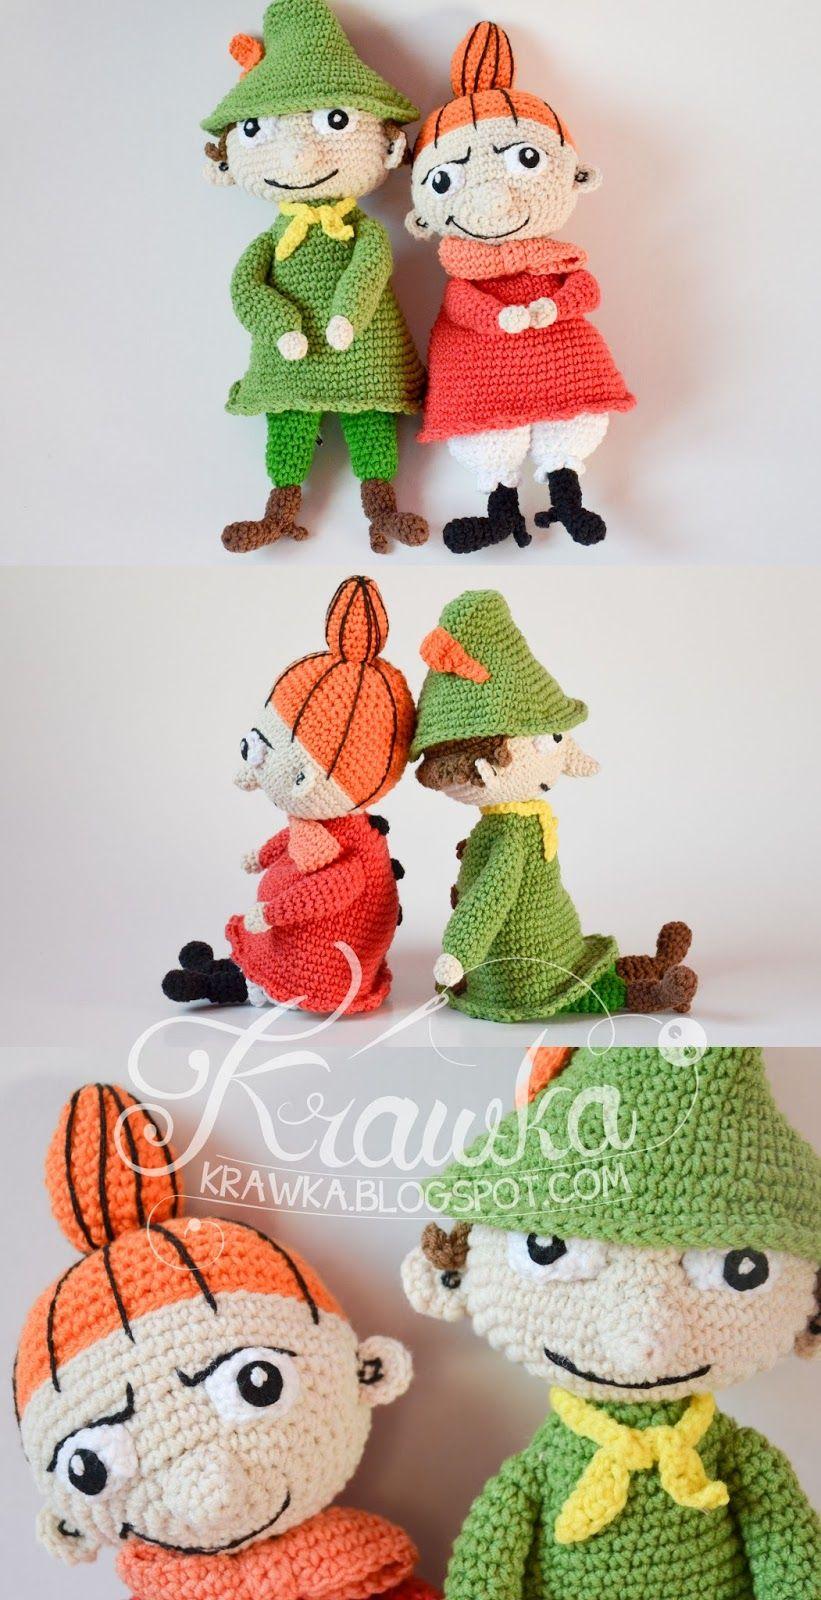 Pin by KamilaKrawczyk on Krawka crochet /amigurumi | Pinterest ...